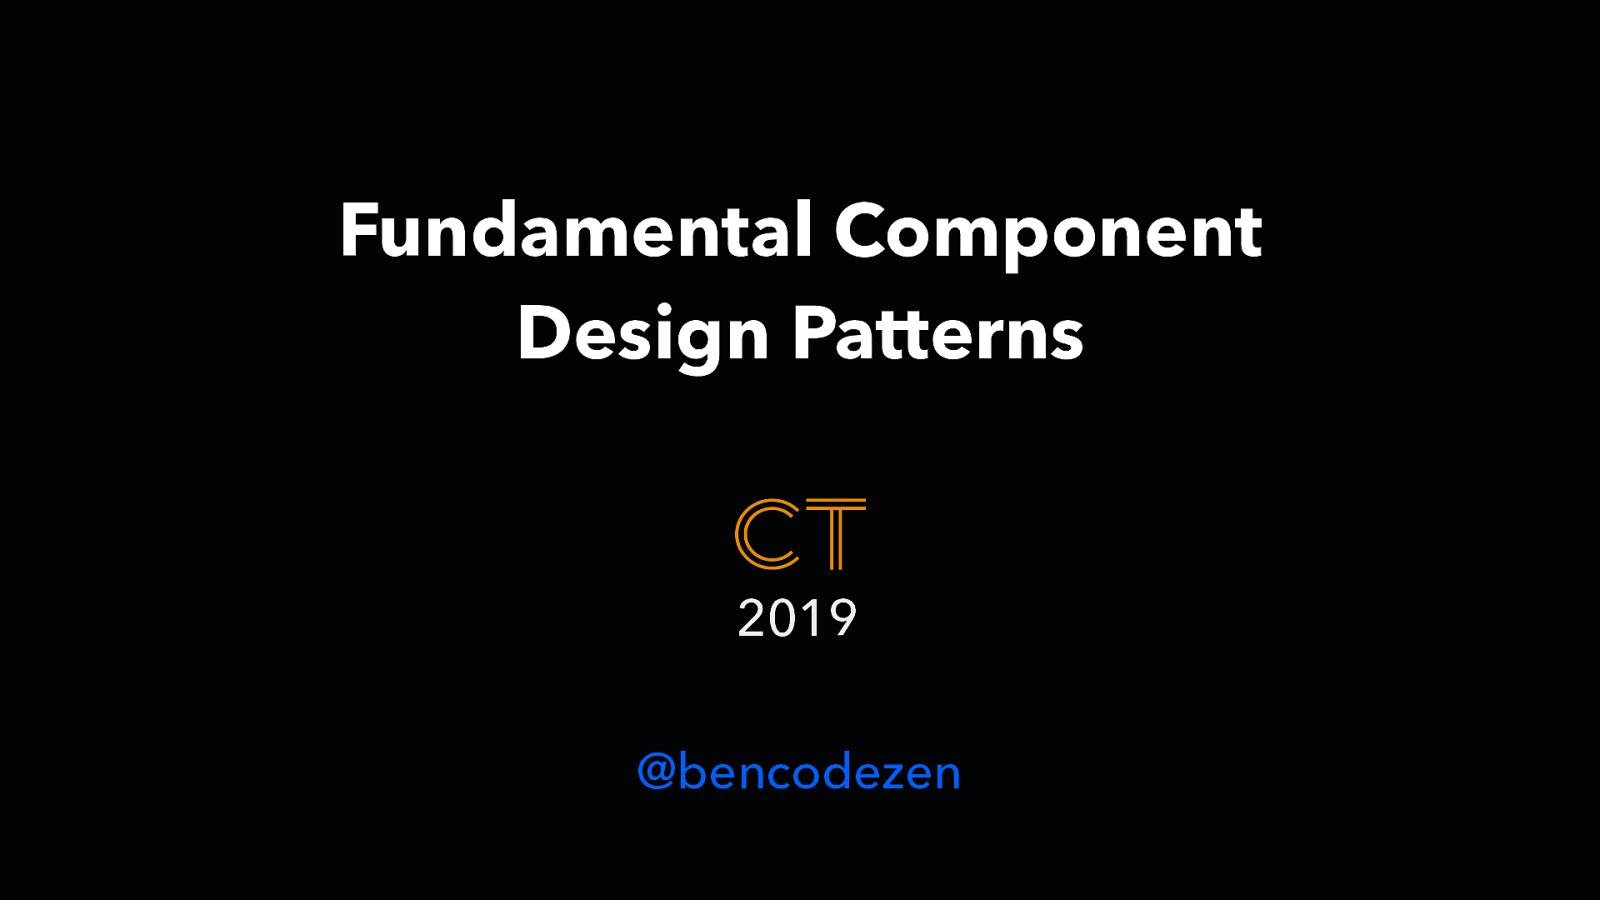 Fundamental Component Design Patterns